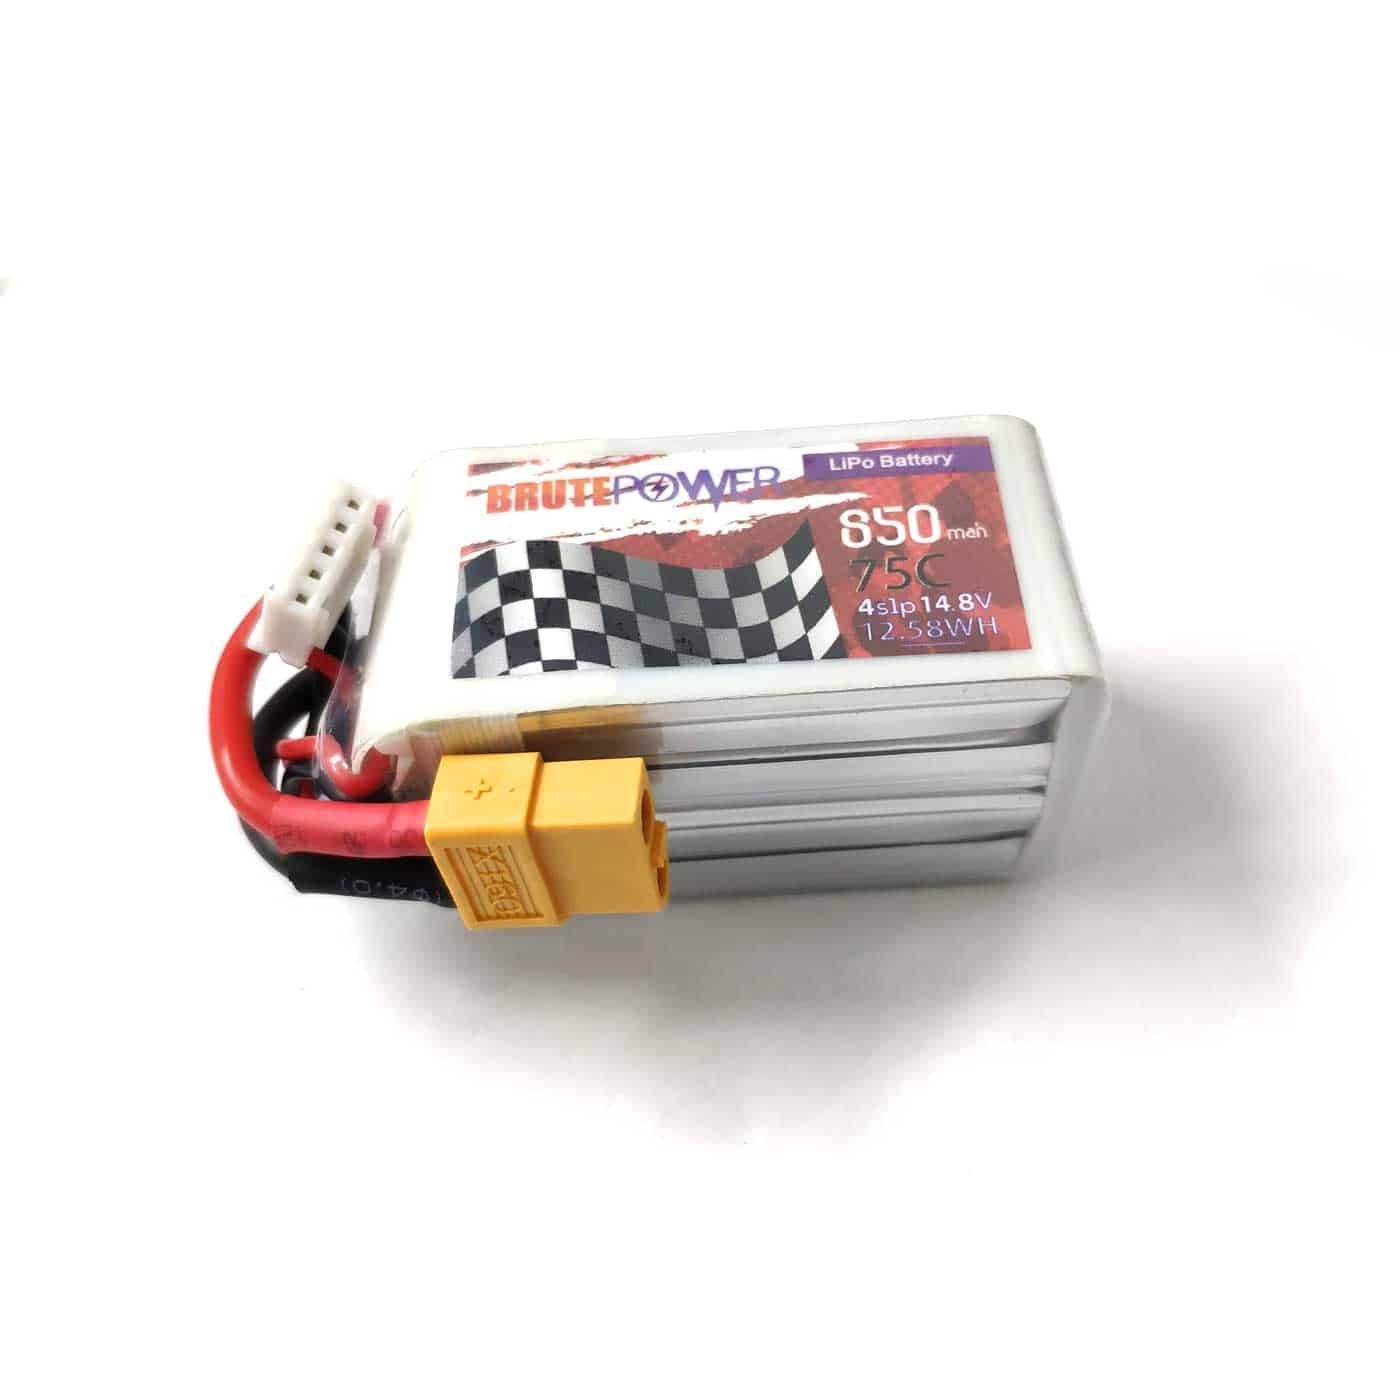 Batería Brutepower 4s 850mah 75C